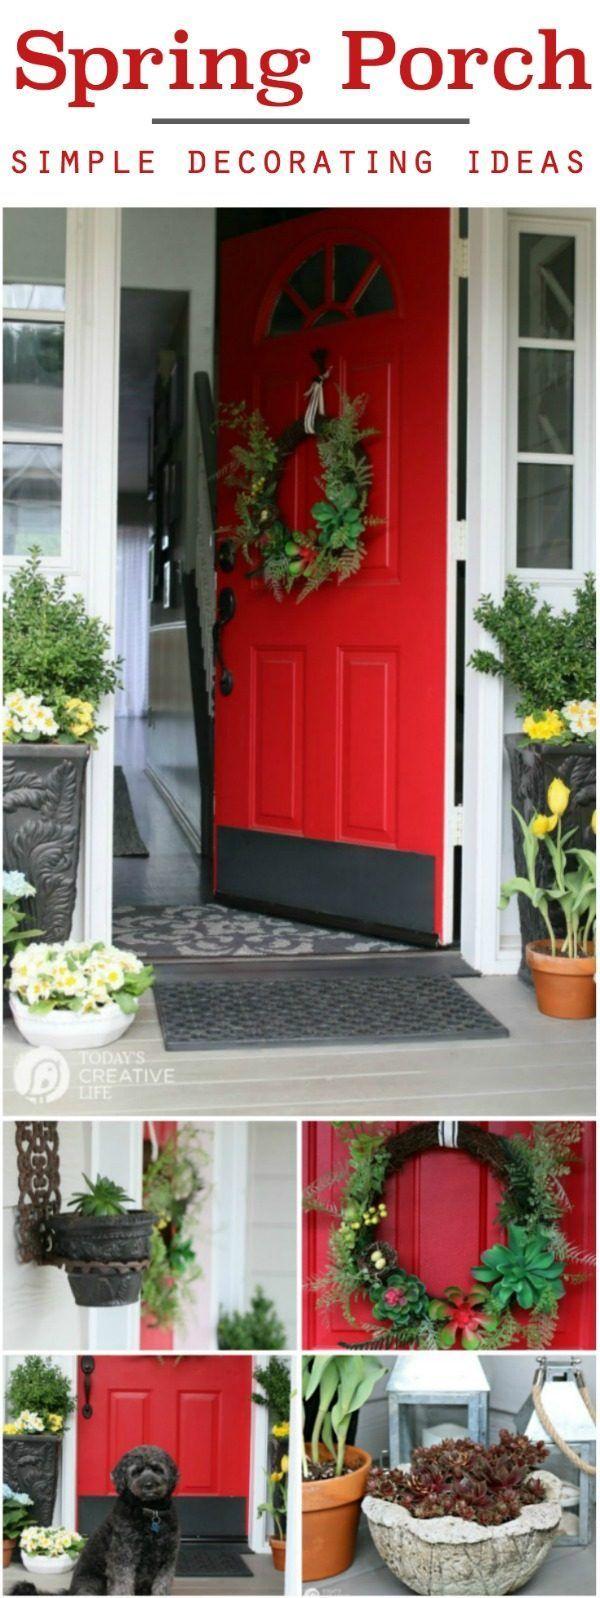 Front Porch Ideas | Decorating your porch for Spring. Small front porch simple DIY decorating ideas for spring. TodaysCreativeLife.com